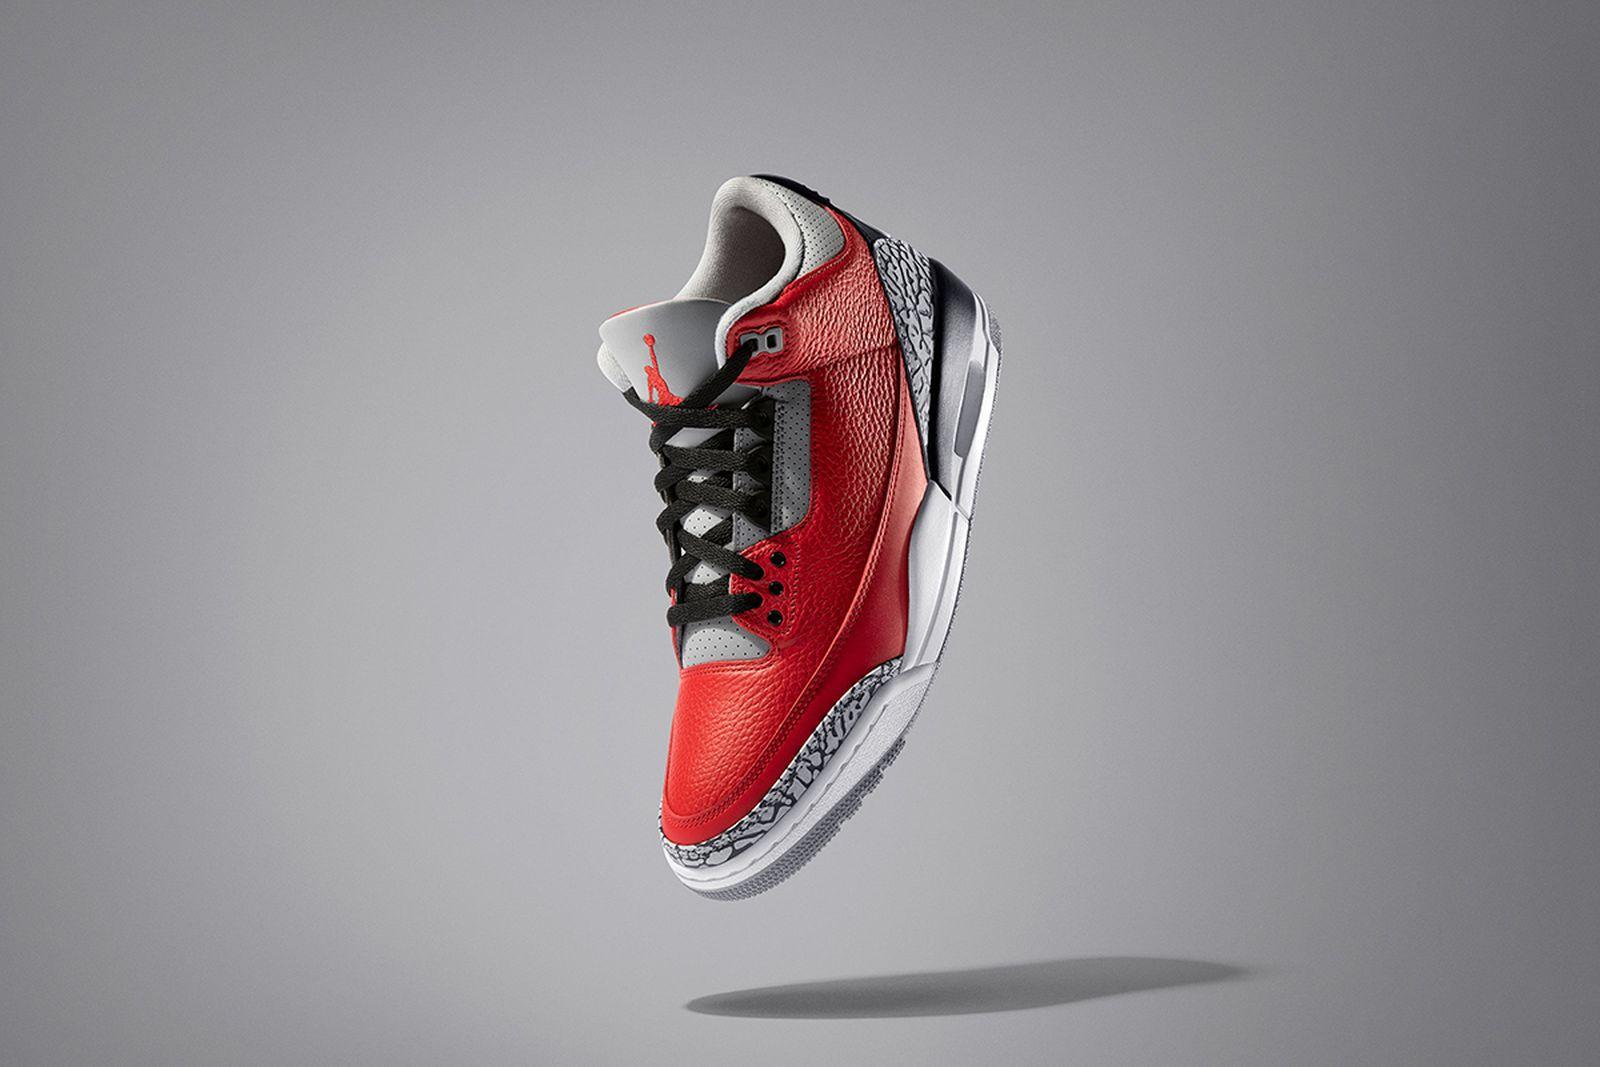 air-jordan-3-retro-u-release-date-price-01